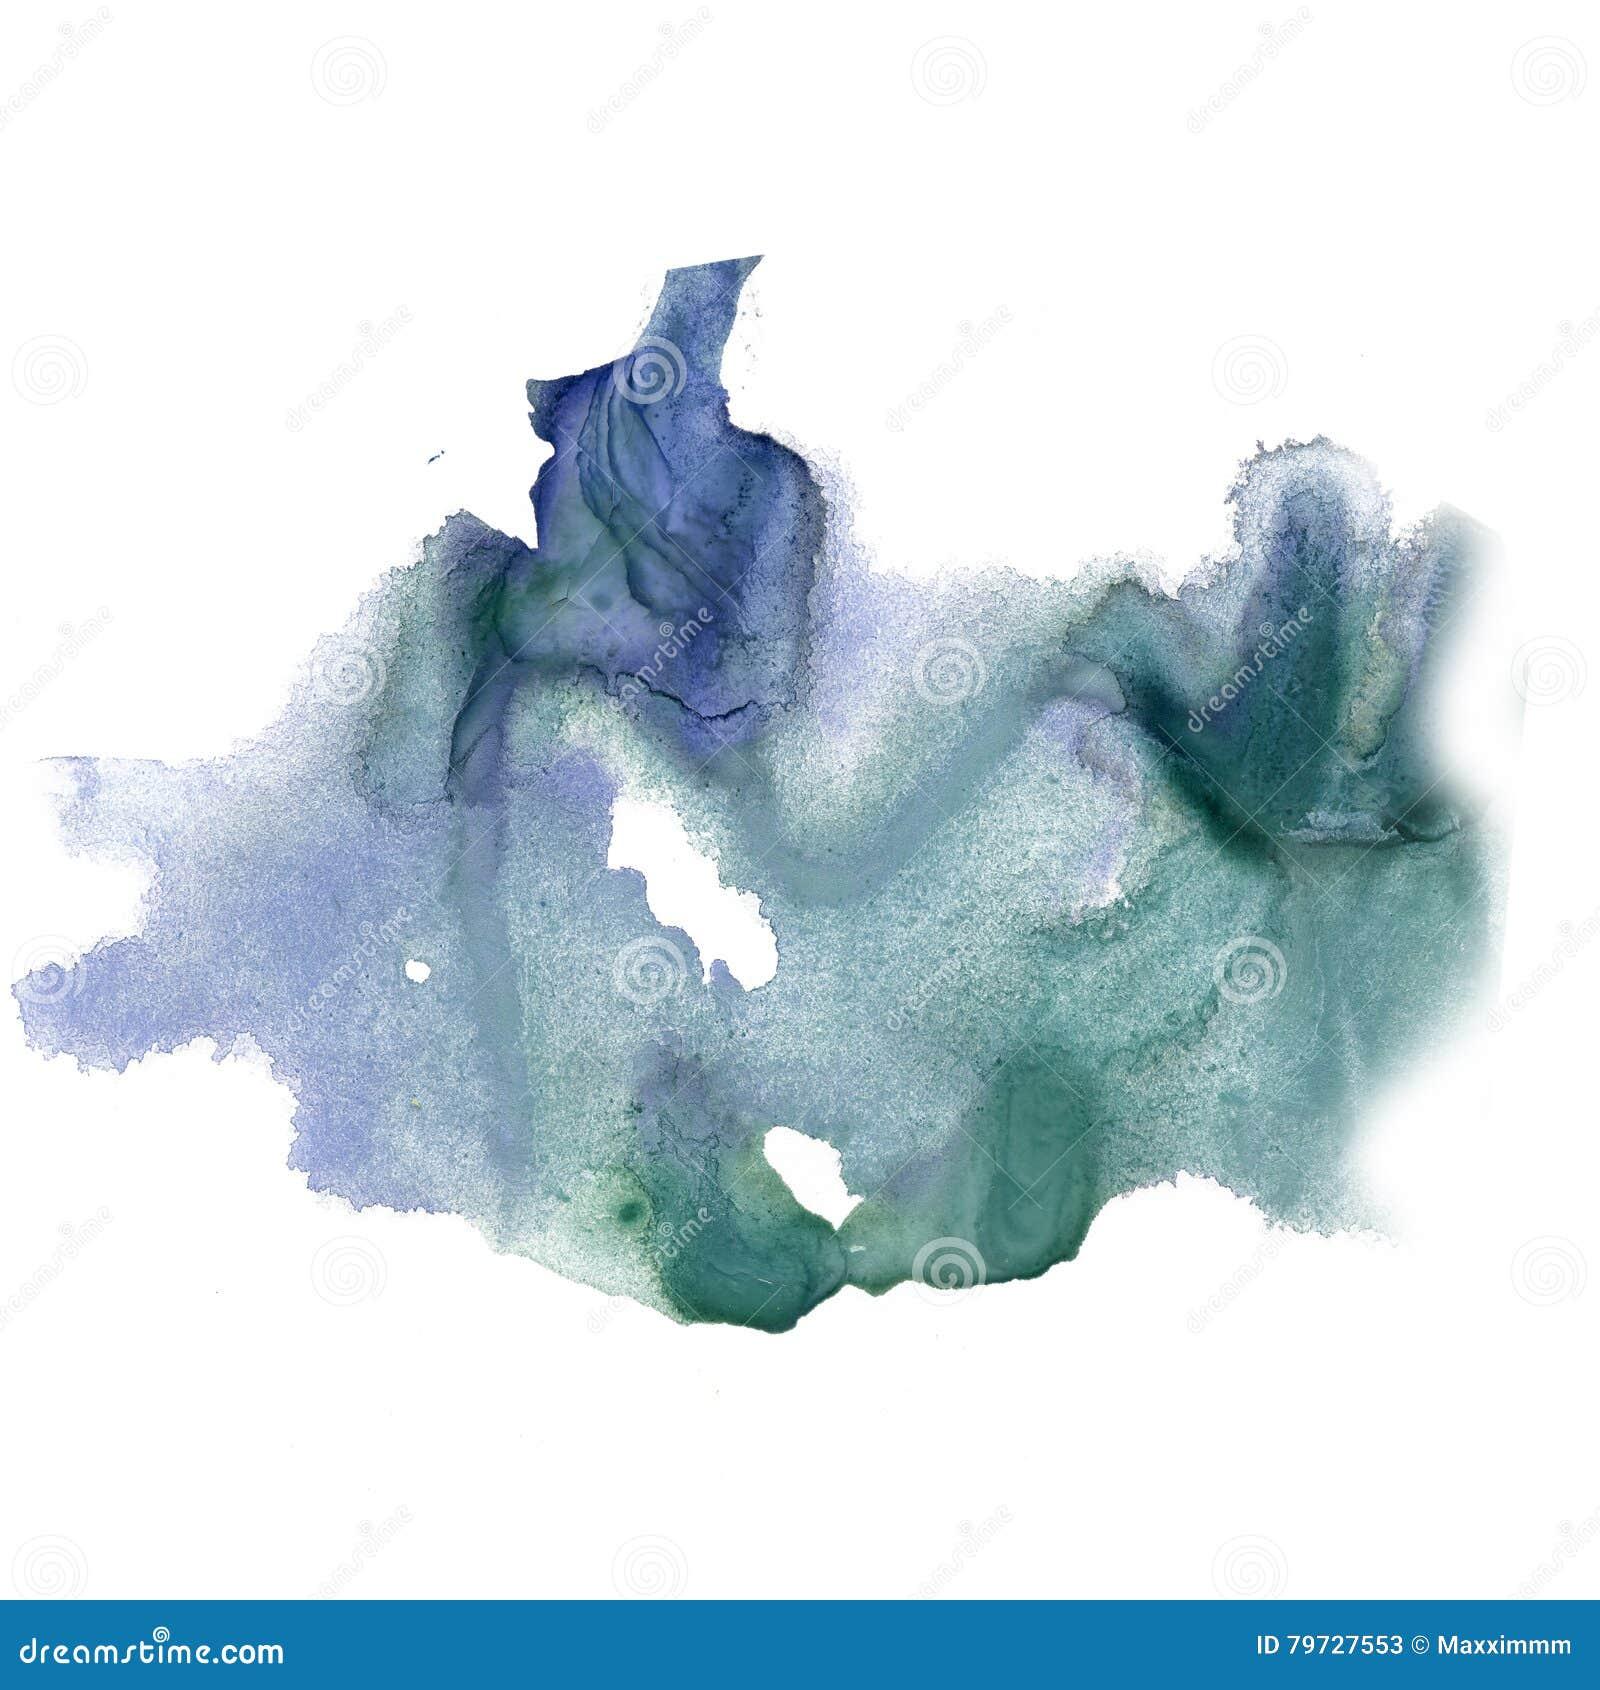 Textura macra de la mancha del punto de la acuarela líquida del verde azul del tinte del watercolour de la salpicadura de la tint